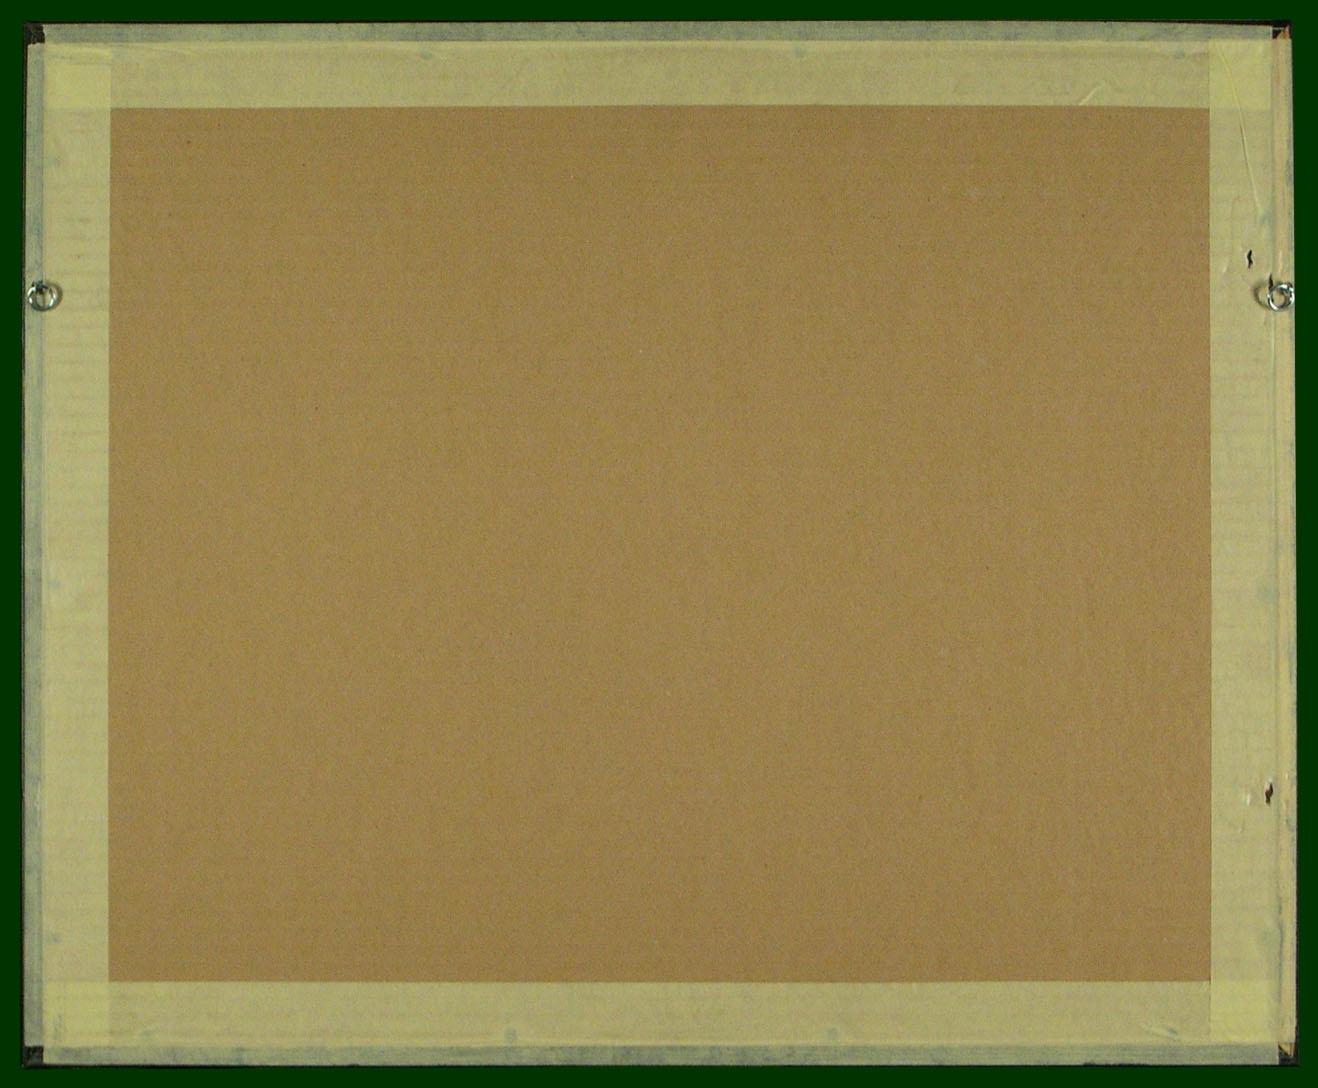 64-2hat.JPG (1318×1088)